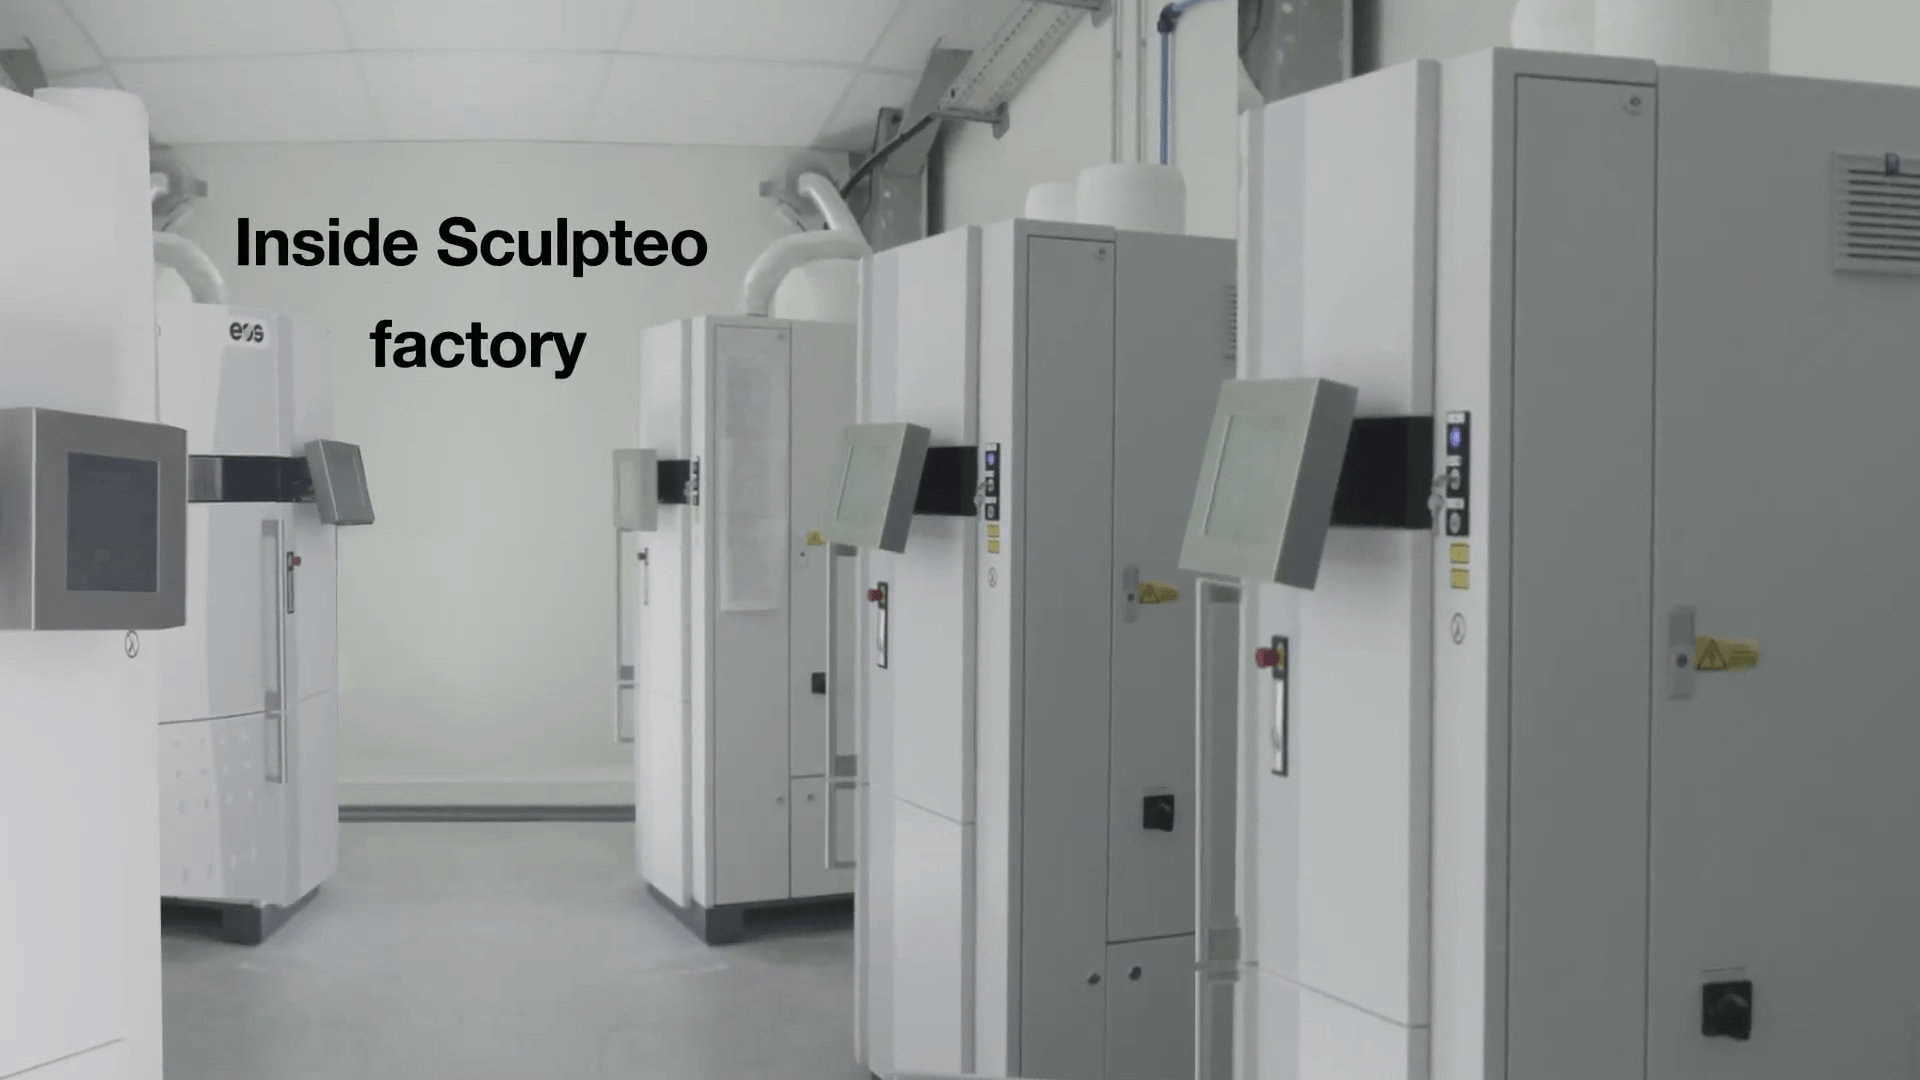 New European Factory for Sculpteo - Sculpteo Blog